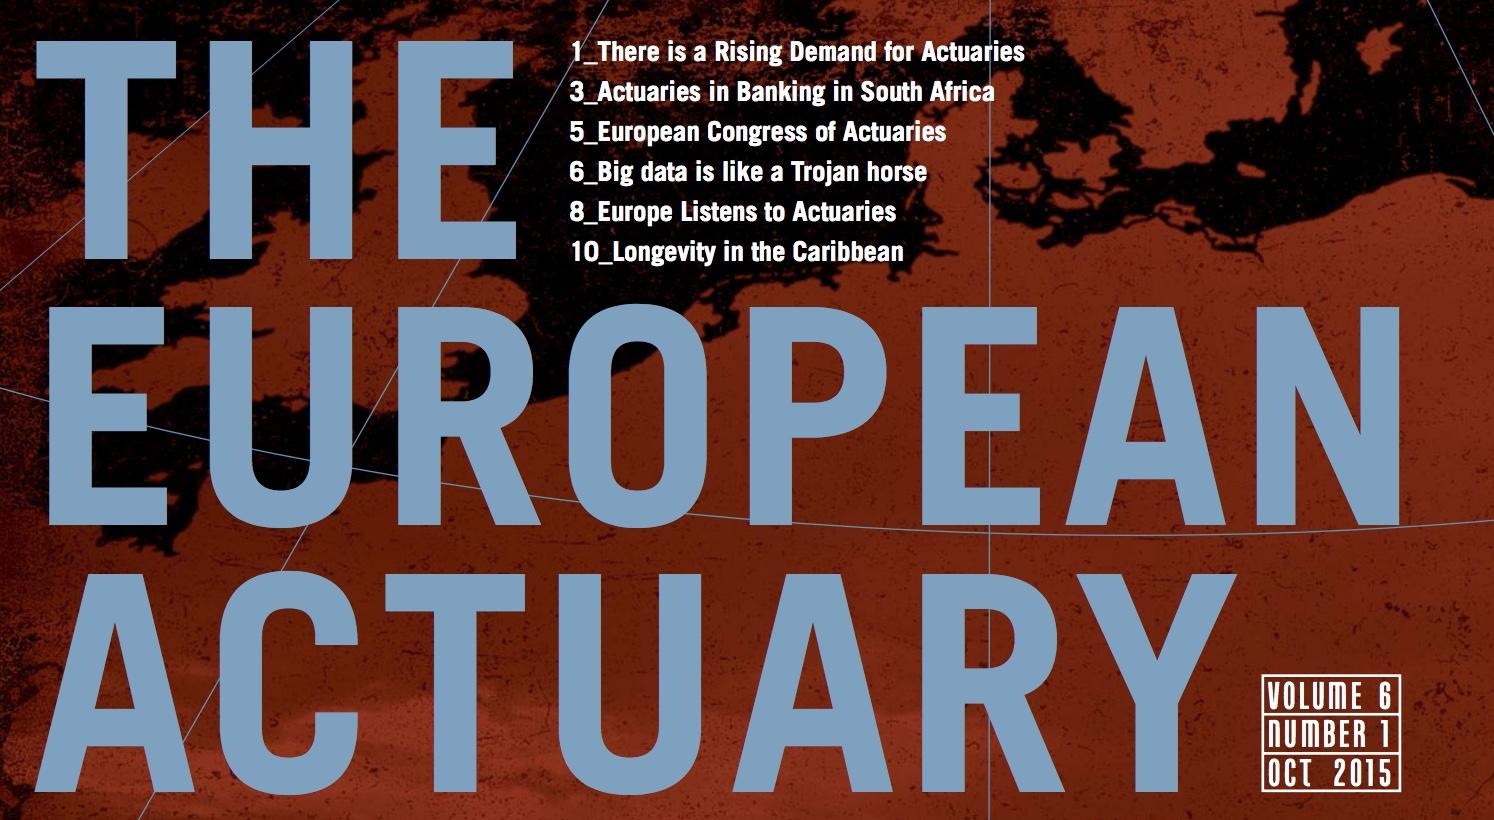 The European Actuary - Vol.6 Nr.1